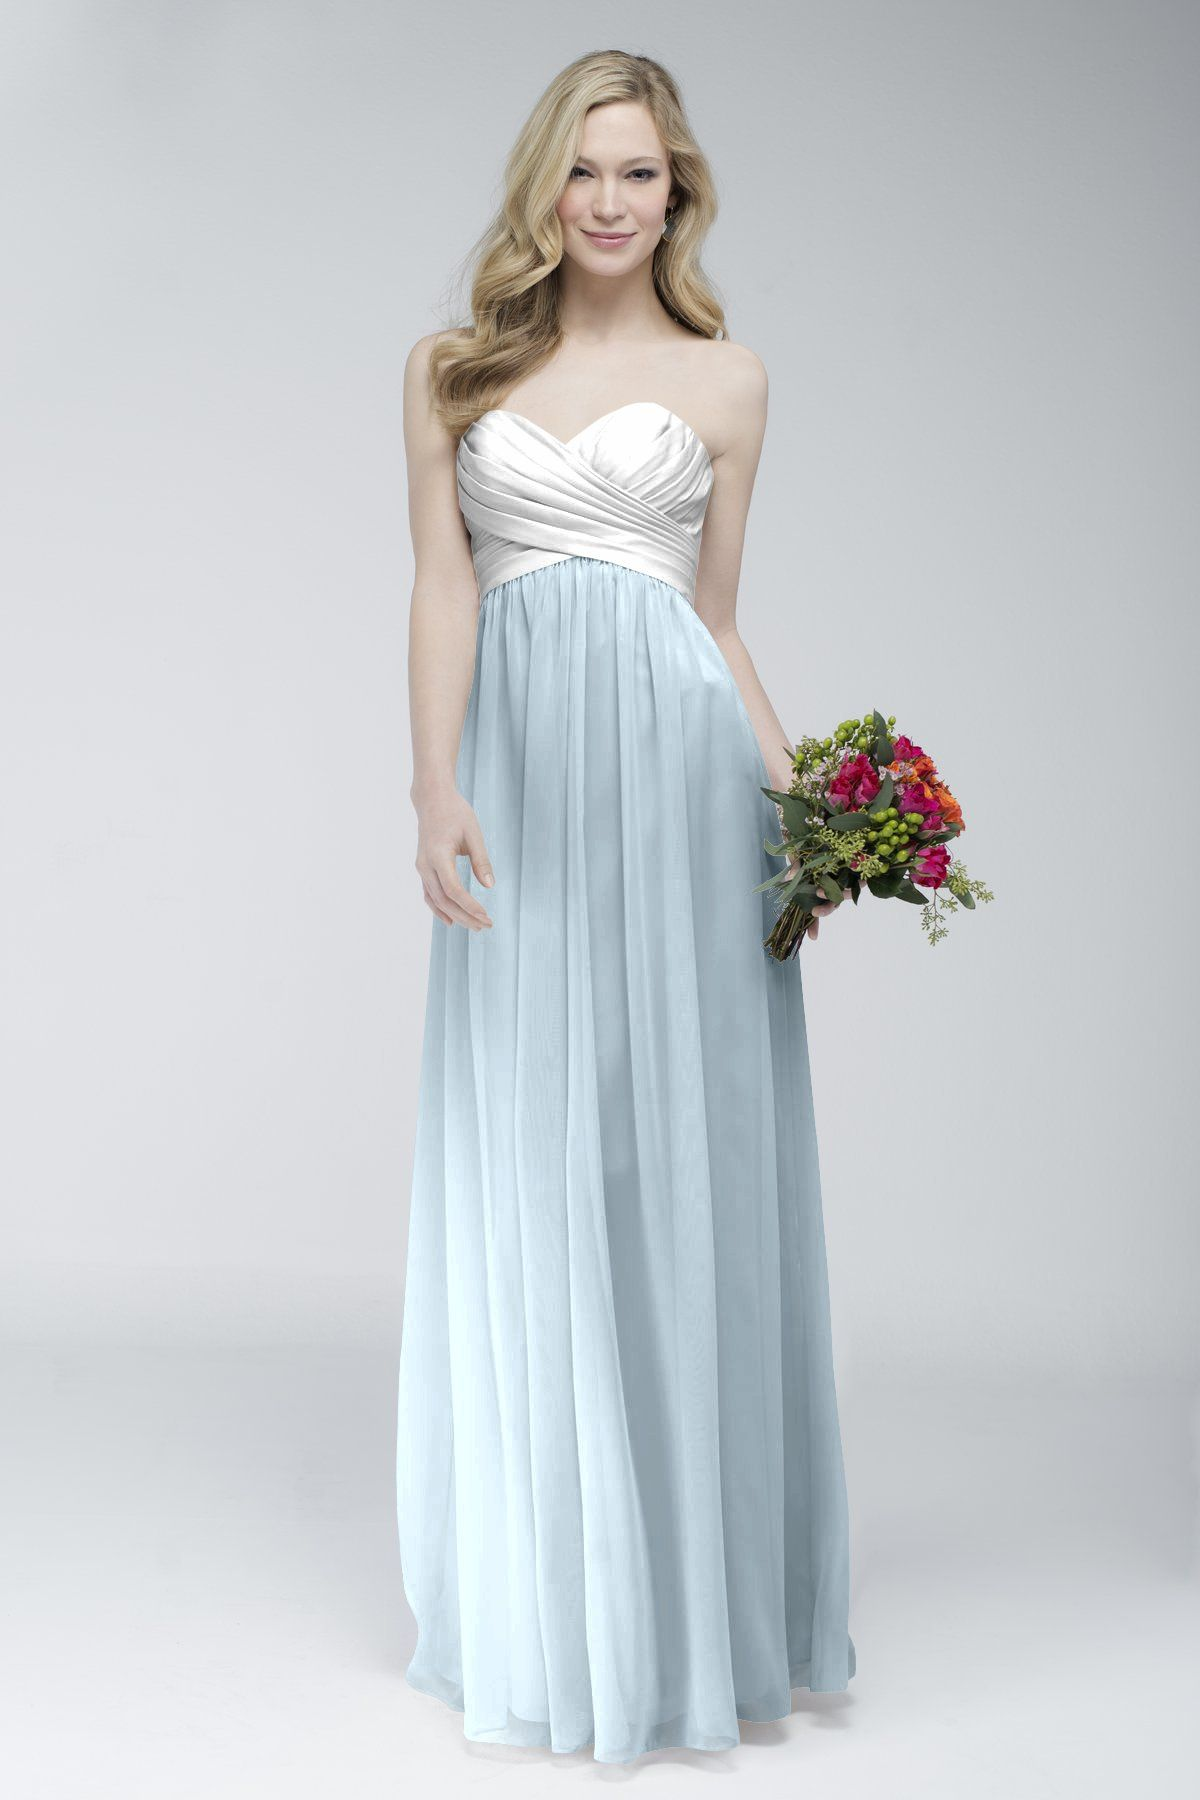 Wedding Party Fashion and Bridal Accessories | Weddington Way ...